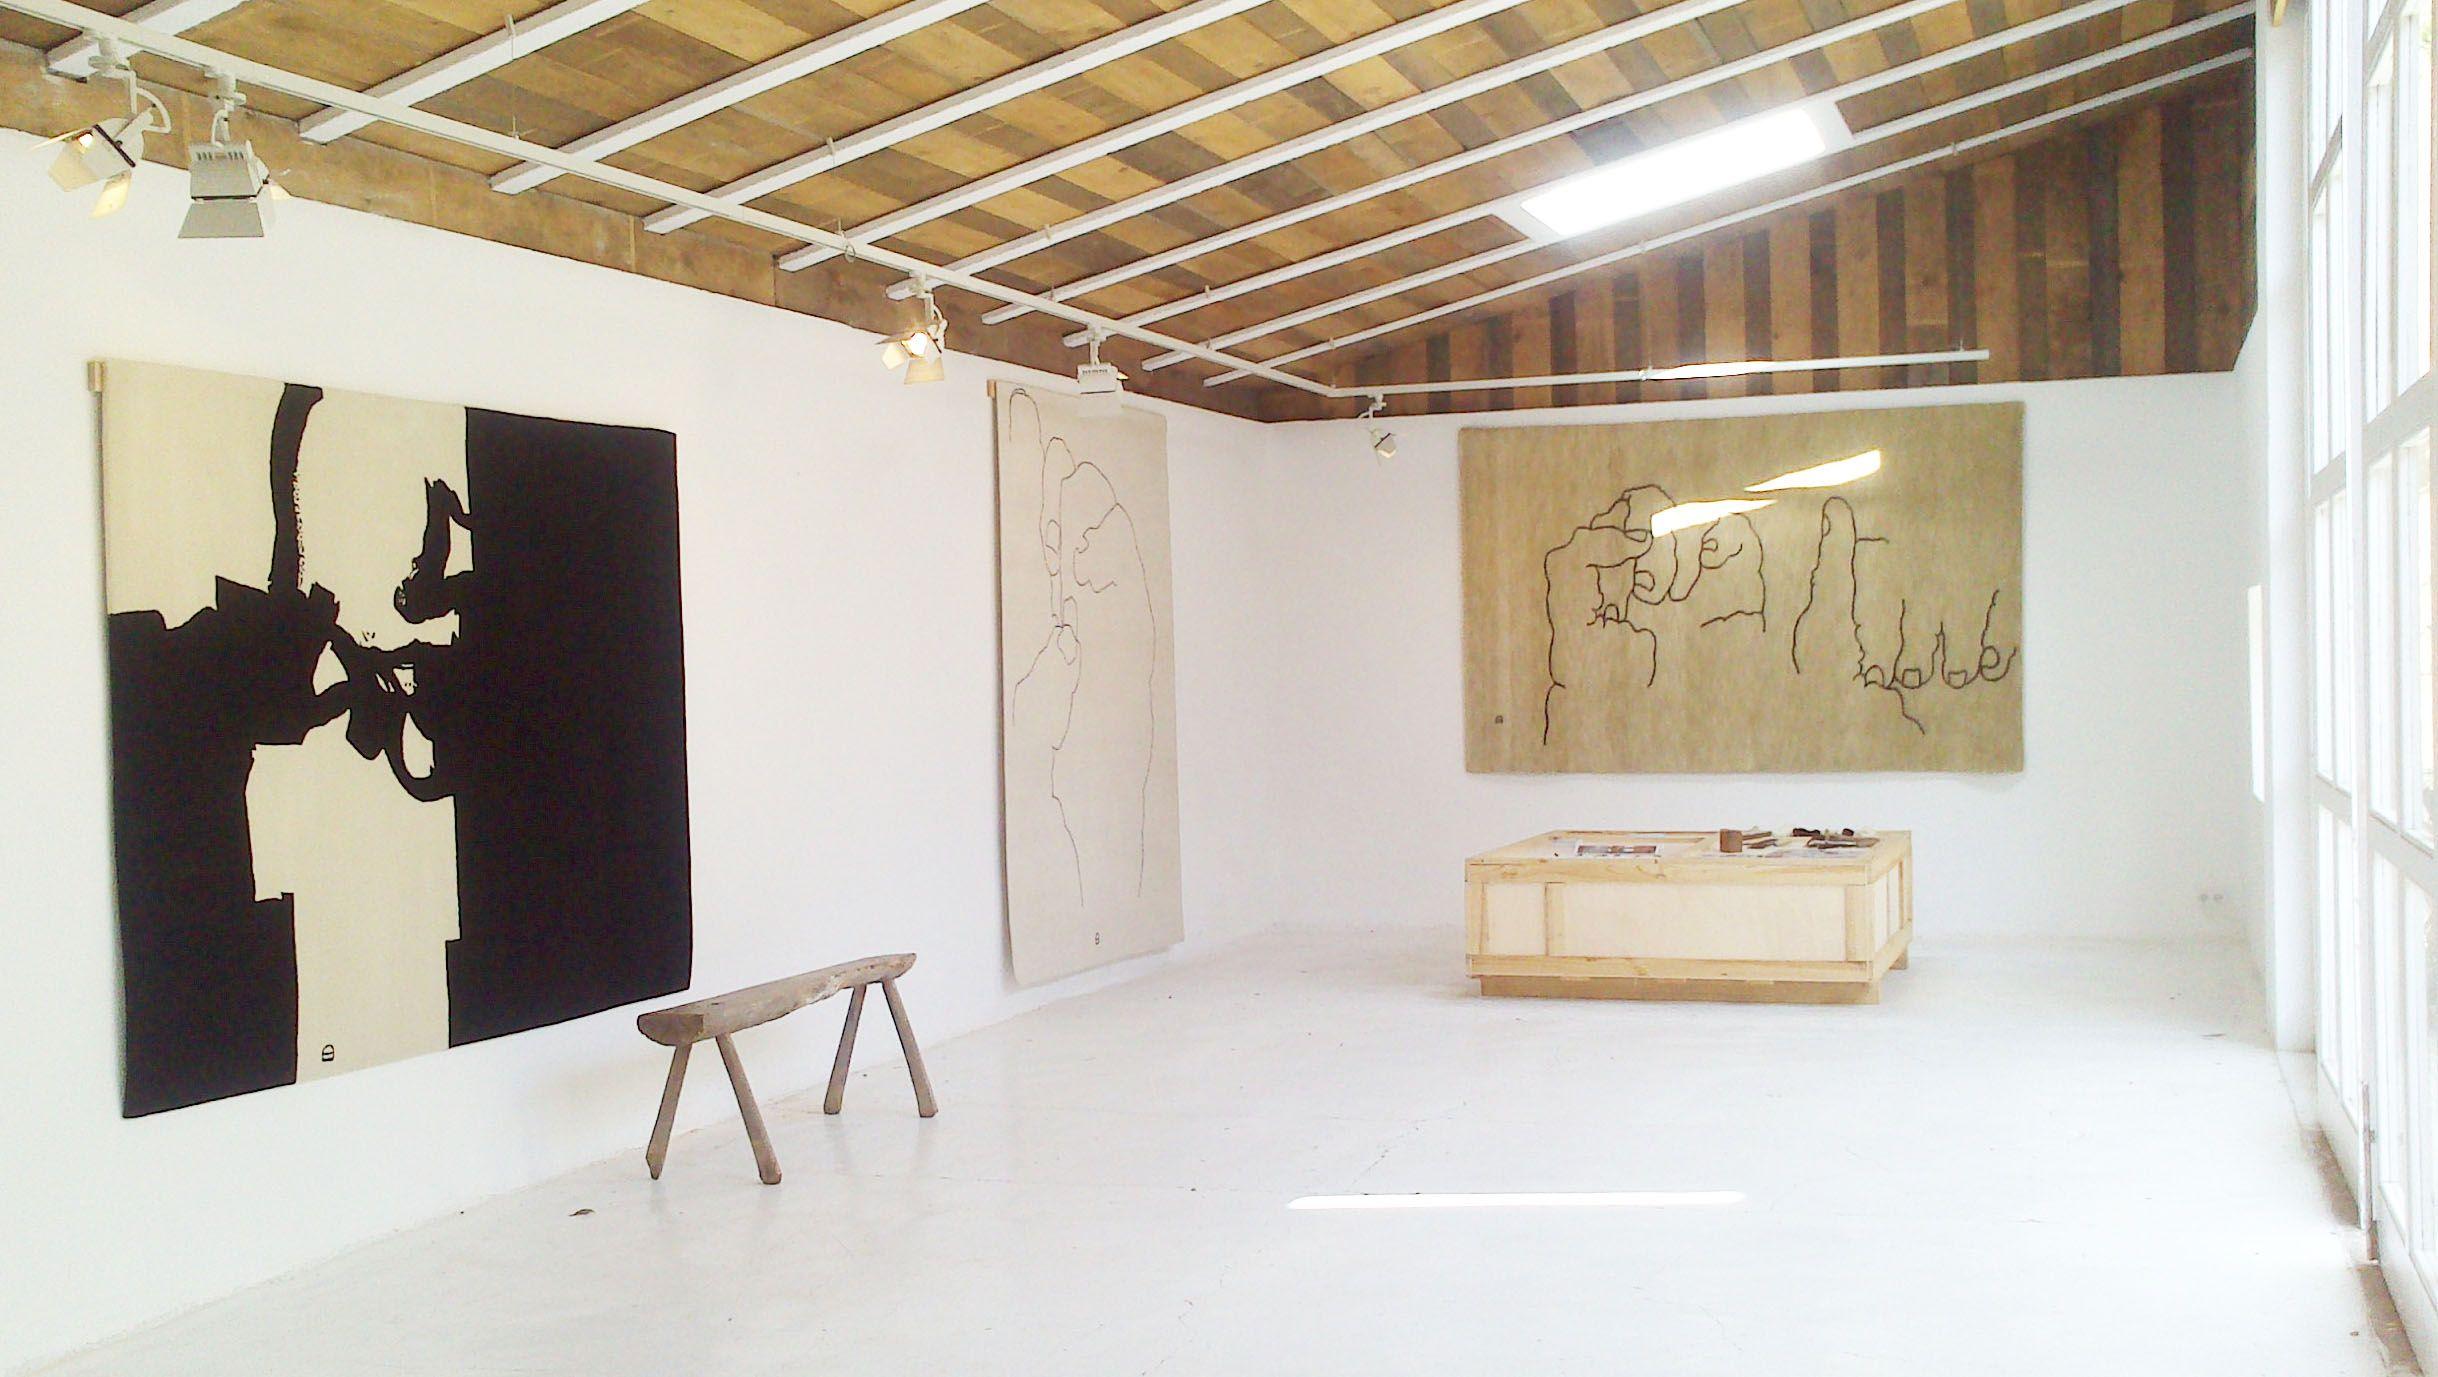 Rabari Vloerkleden Nanimarquina : Collage 1966 u2013 design rugs u2013 nanimarquina painting*畵 pinterest